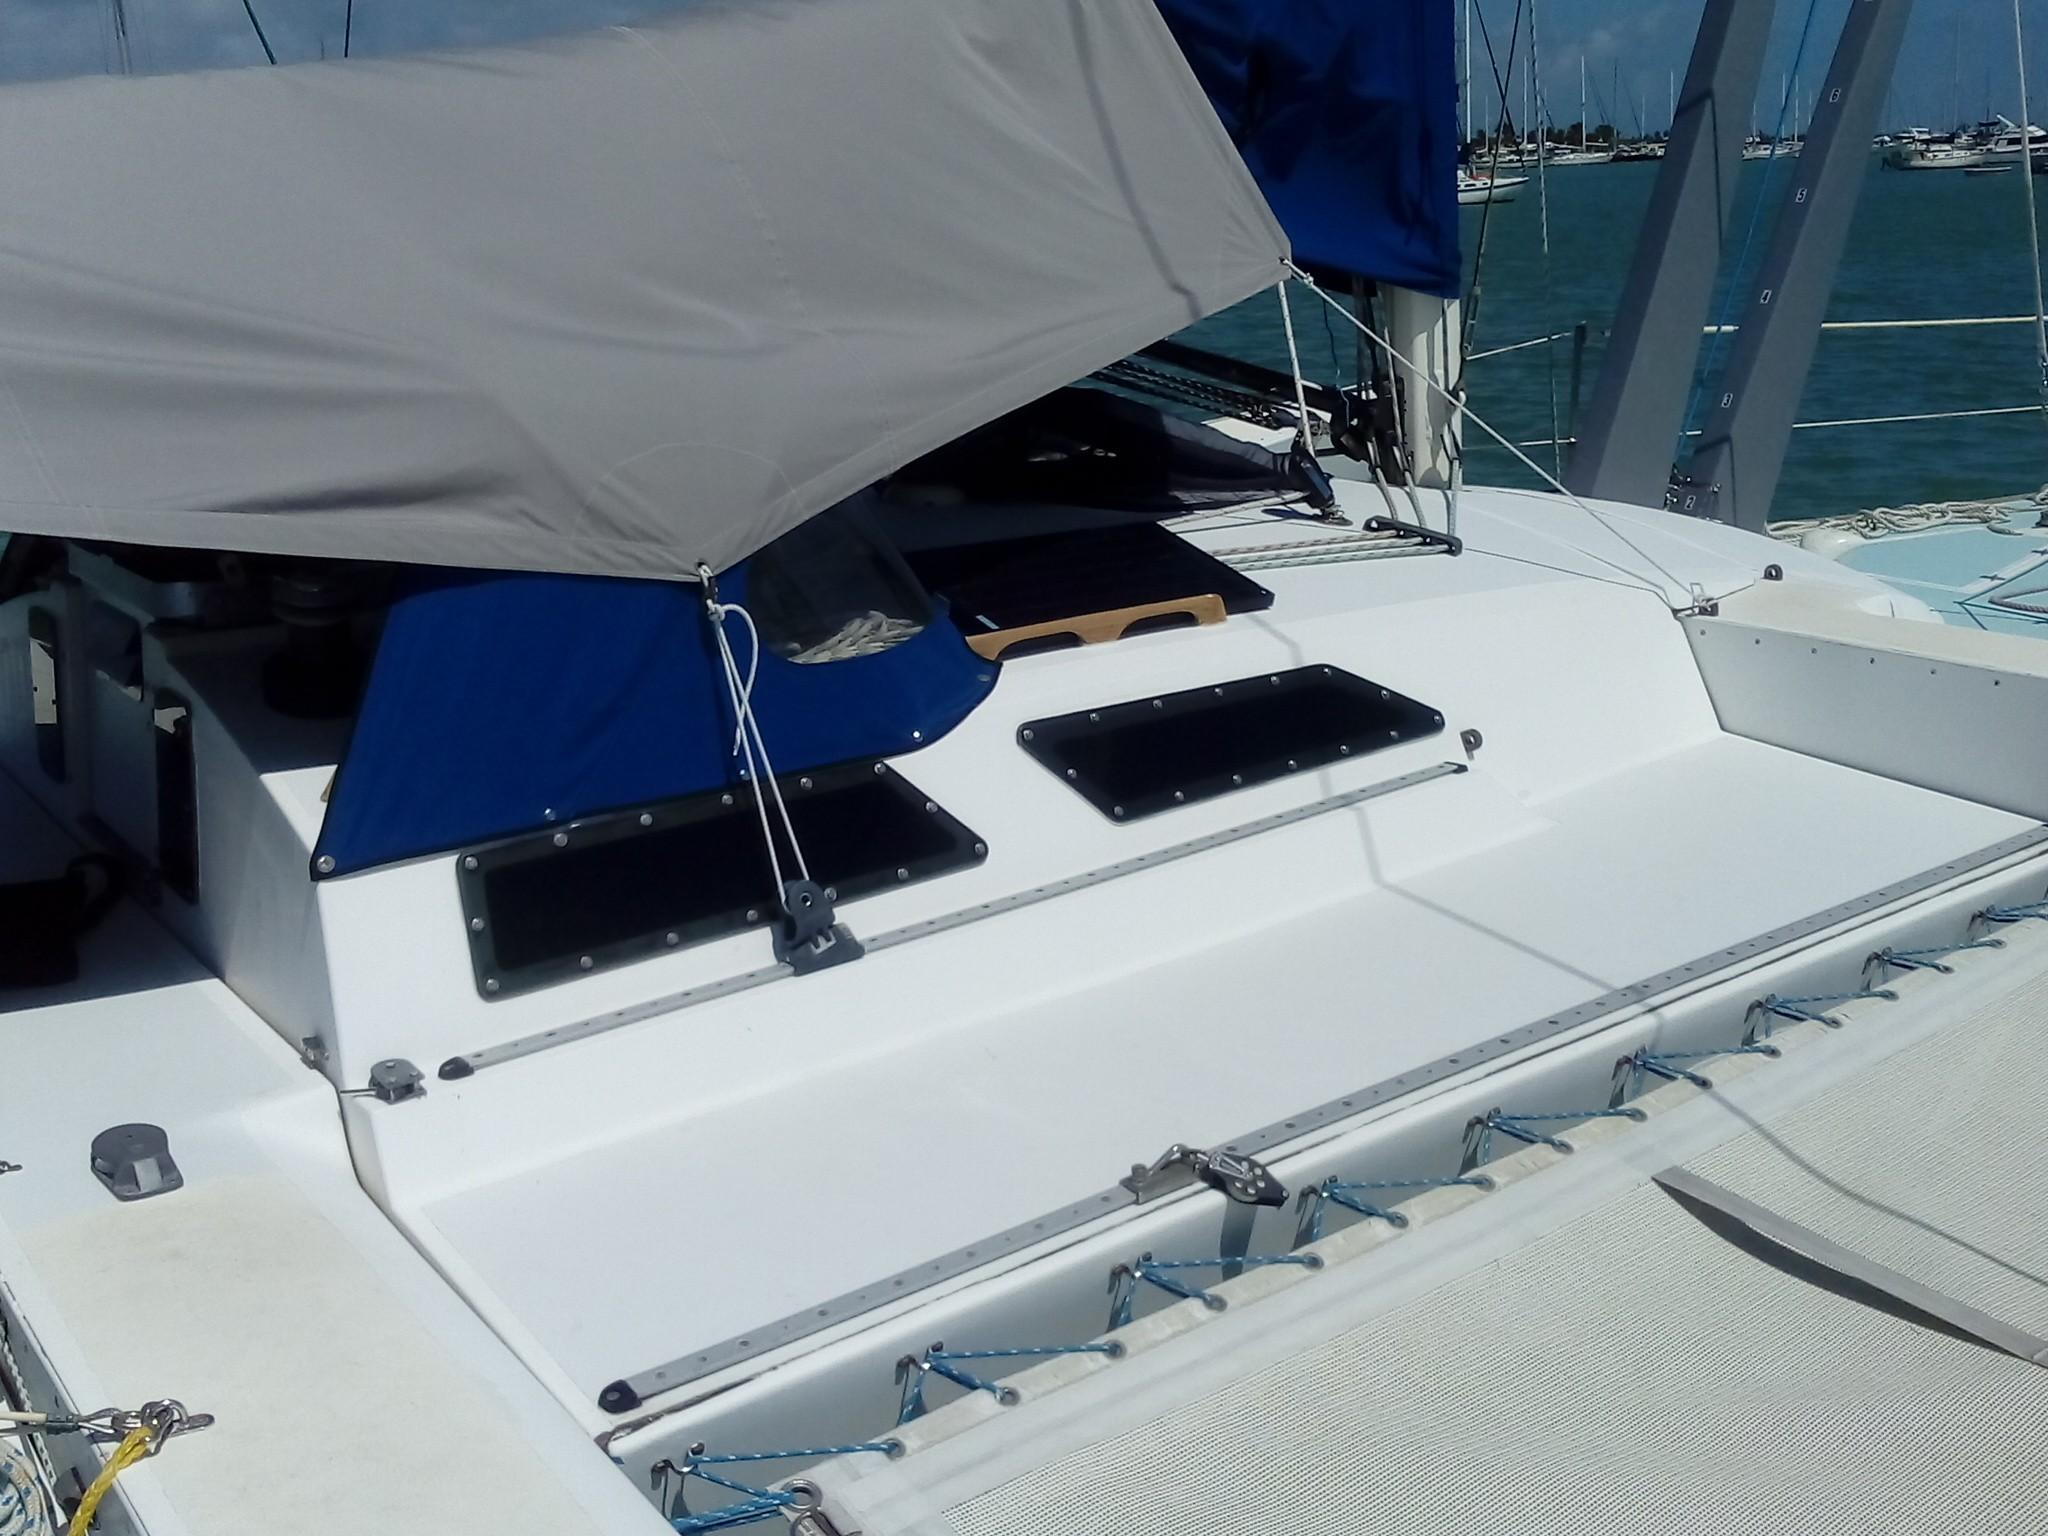 Condor 40 Trimaran | MultiYB - Multihull Yacht Brokerage